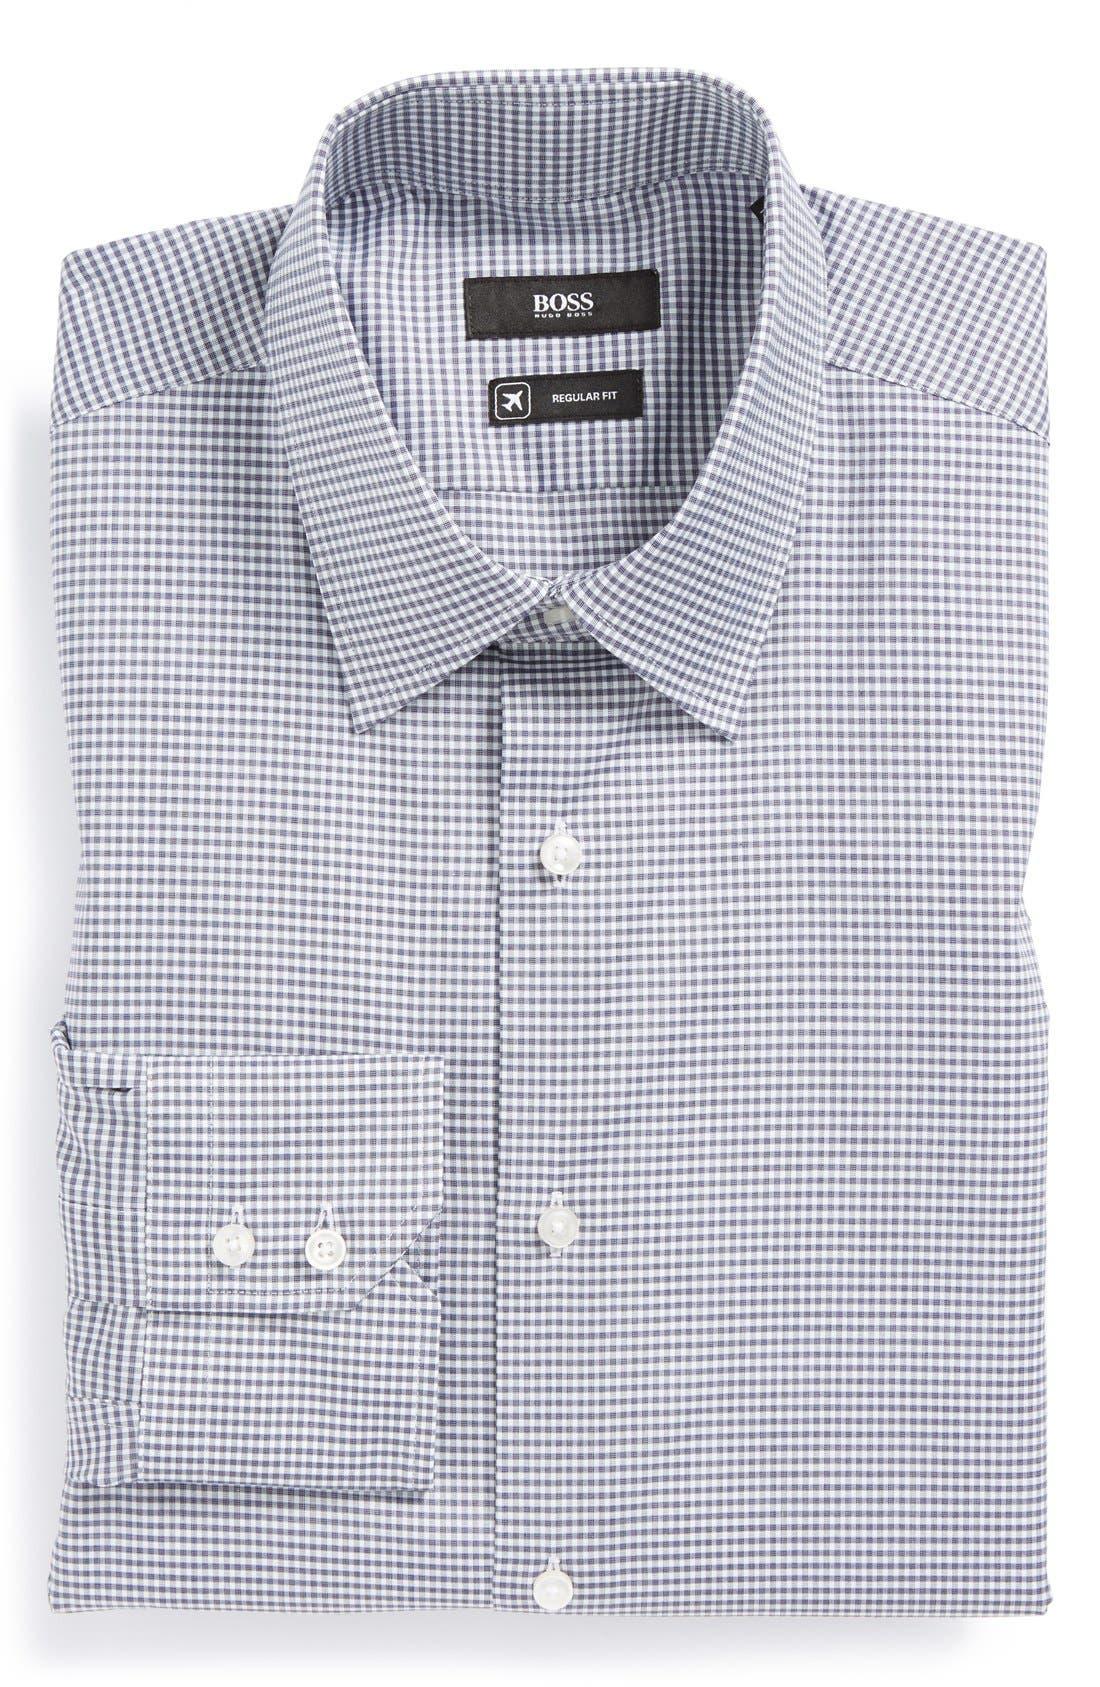 Main Image - BOSS HUGO BOSS 'Enzo WW' Regular Fit Travel Dress Shirt